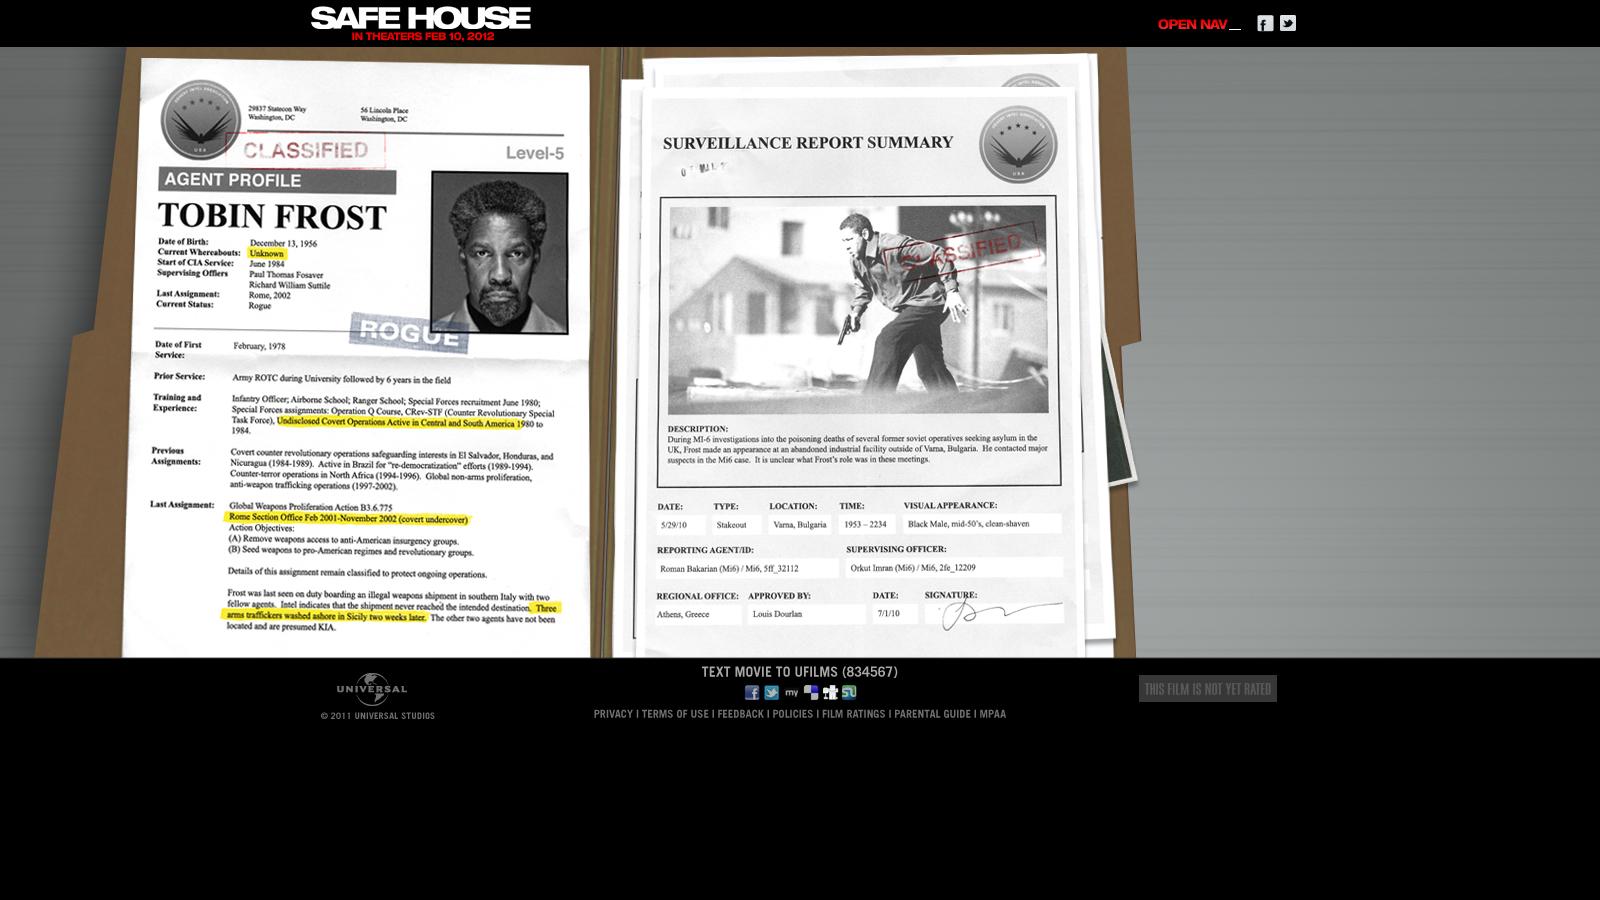 safehouse_dossier2_o.jpg